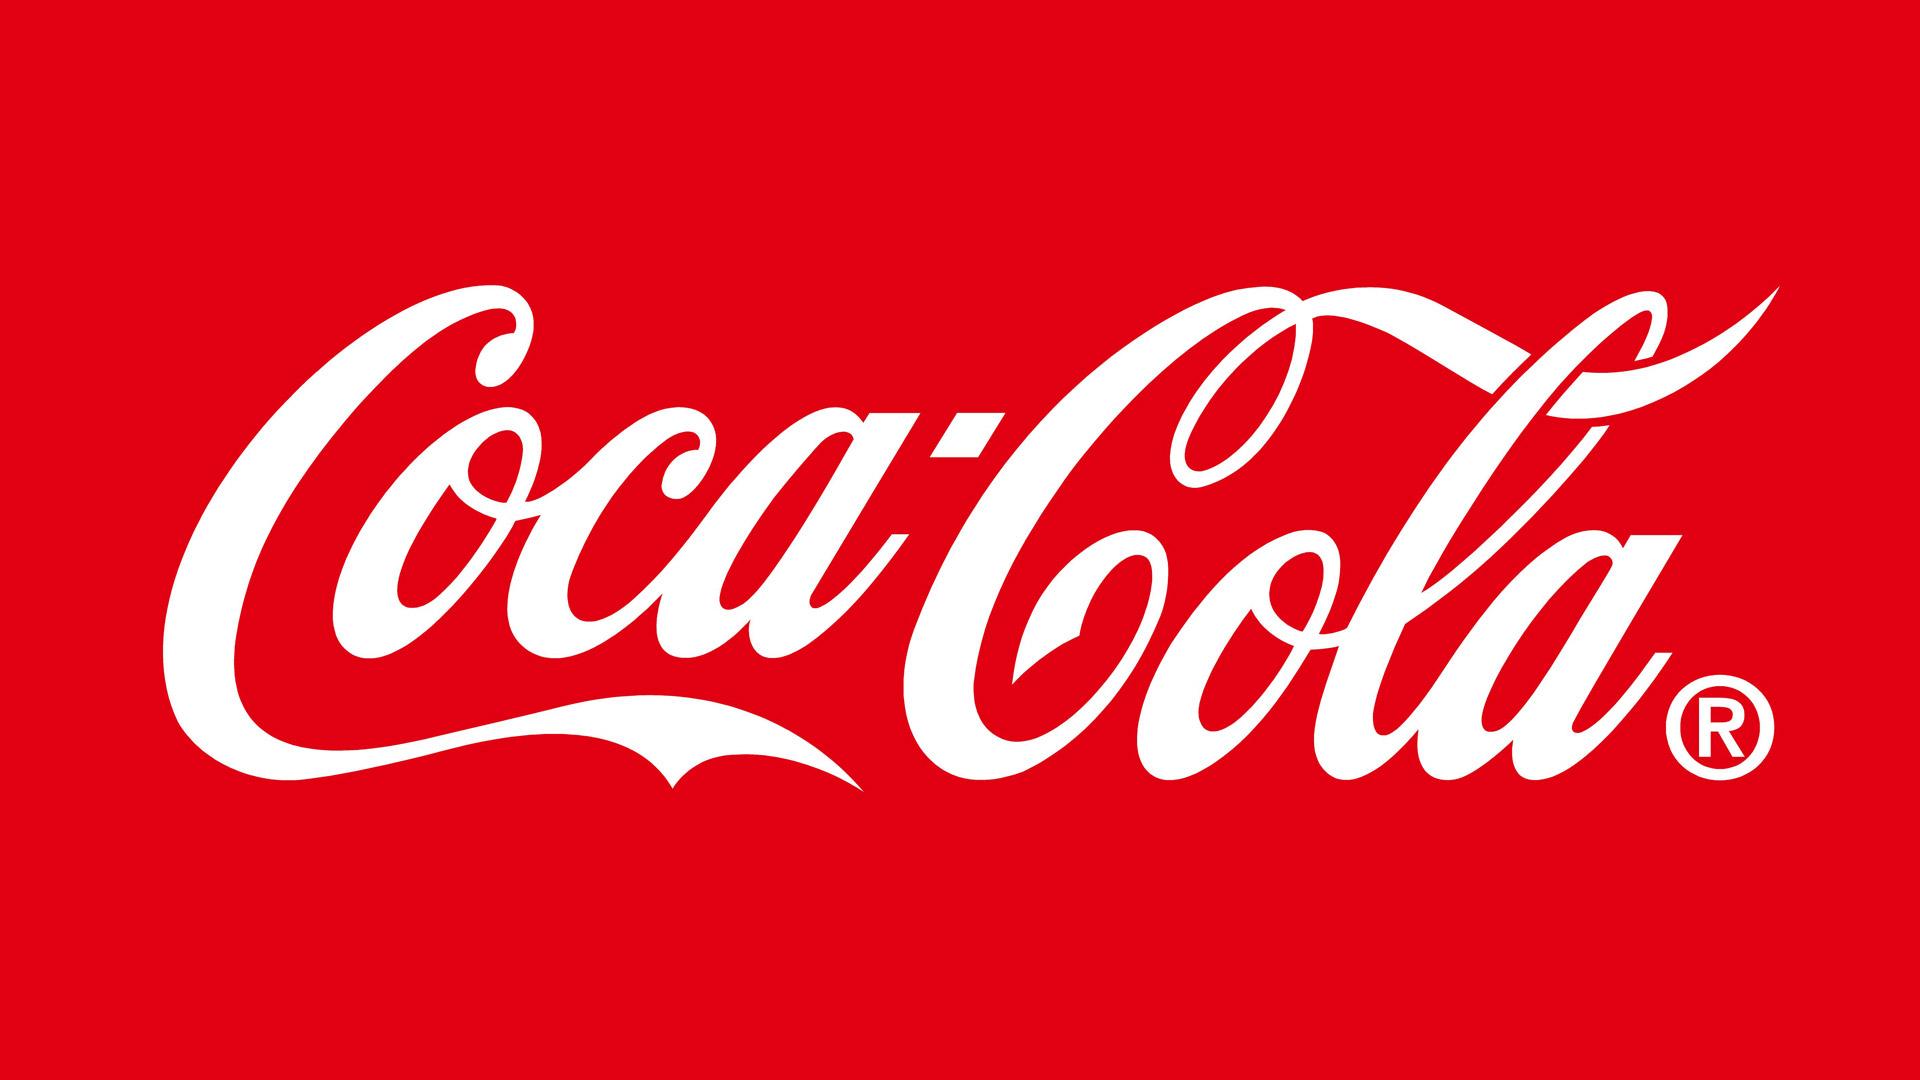 Wallpaper Coca Cola - WallpaperSafari